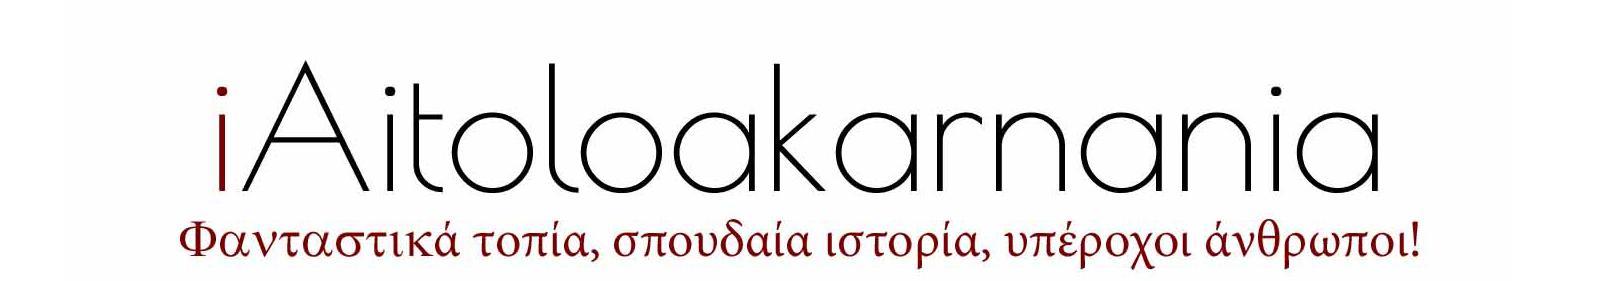 http://iaitoloakarnania.gr/2016/11/gnoriste-santiago-riganeo-gipedo-stolidi-tis-riganis/